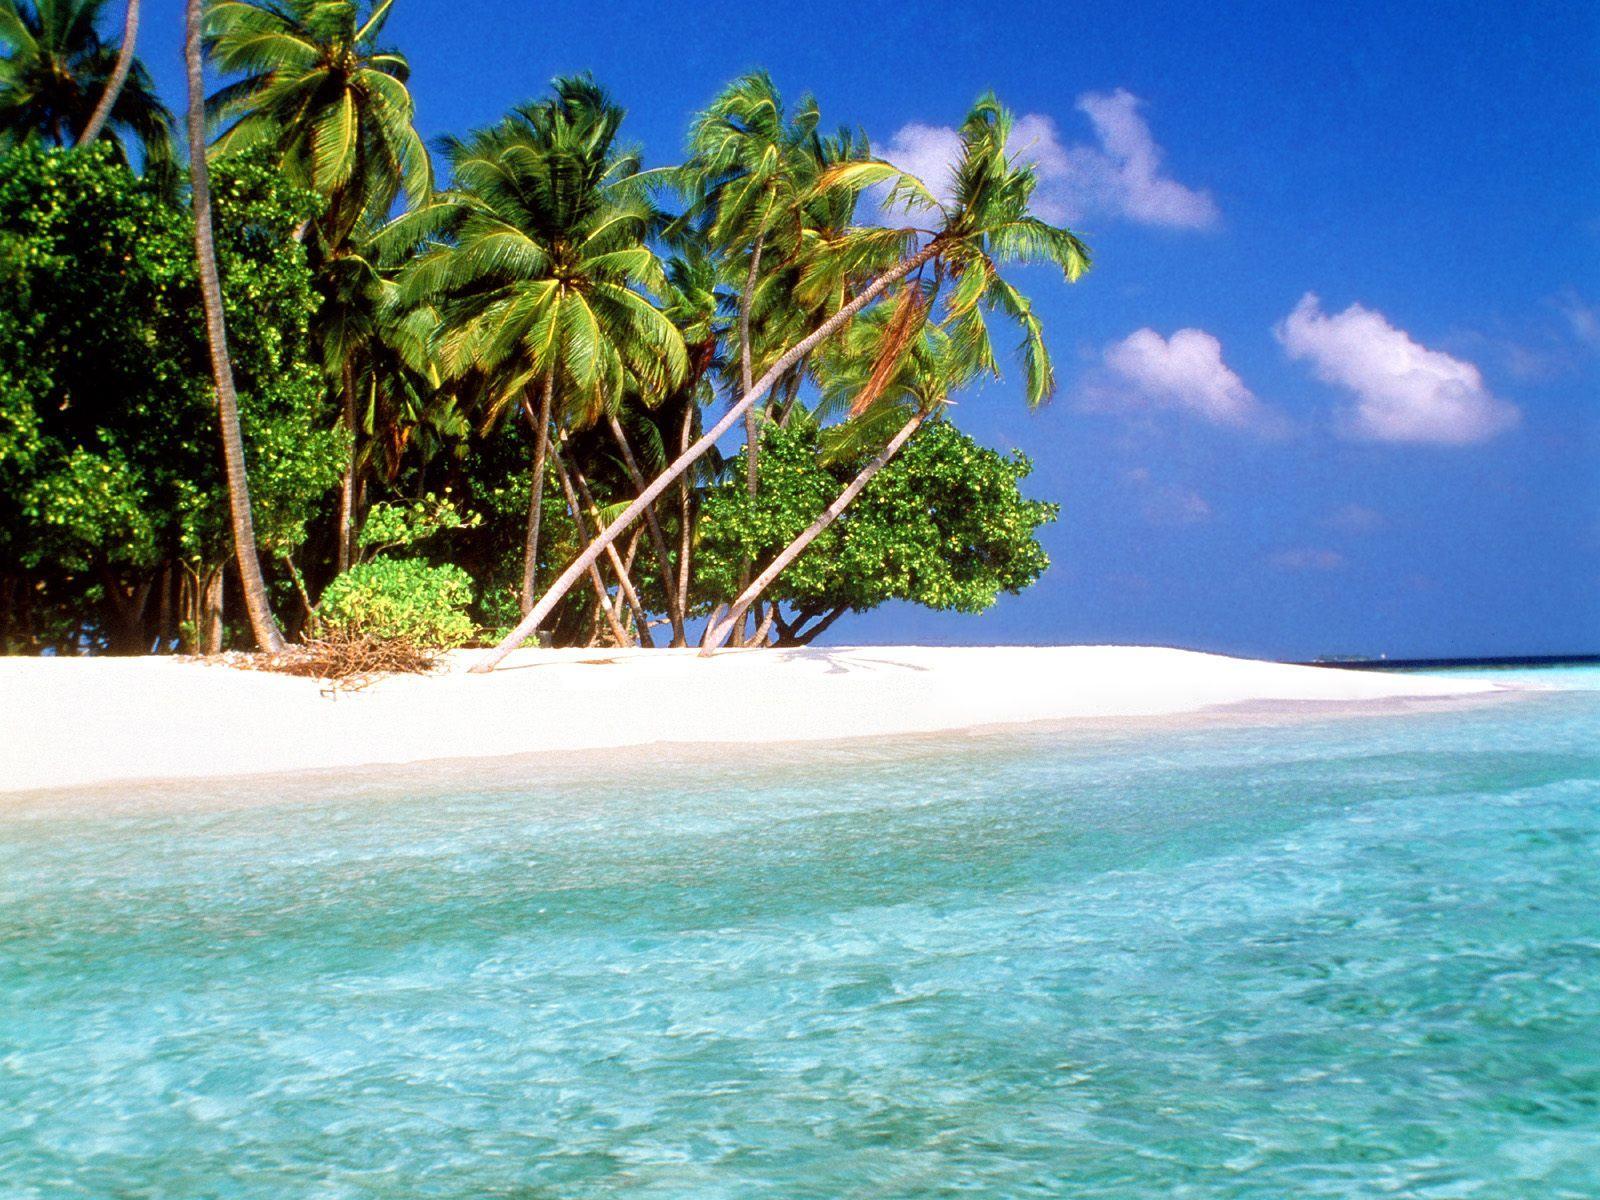 Wallpaper clipart tropical Wonderful beach Free  Wallpapers